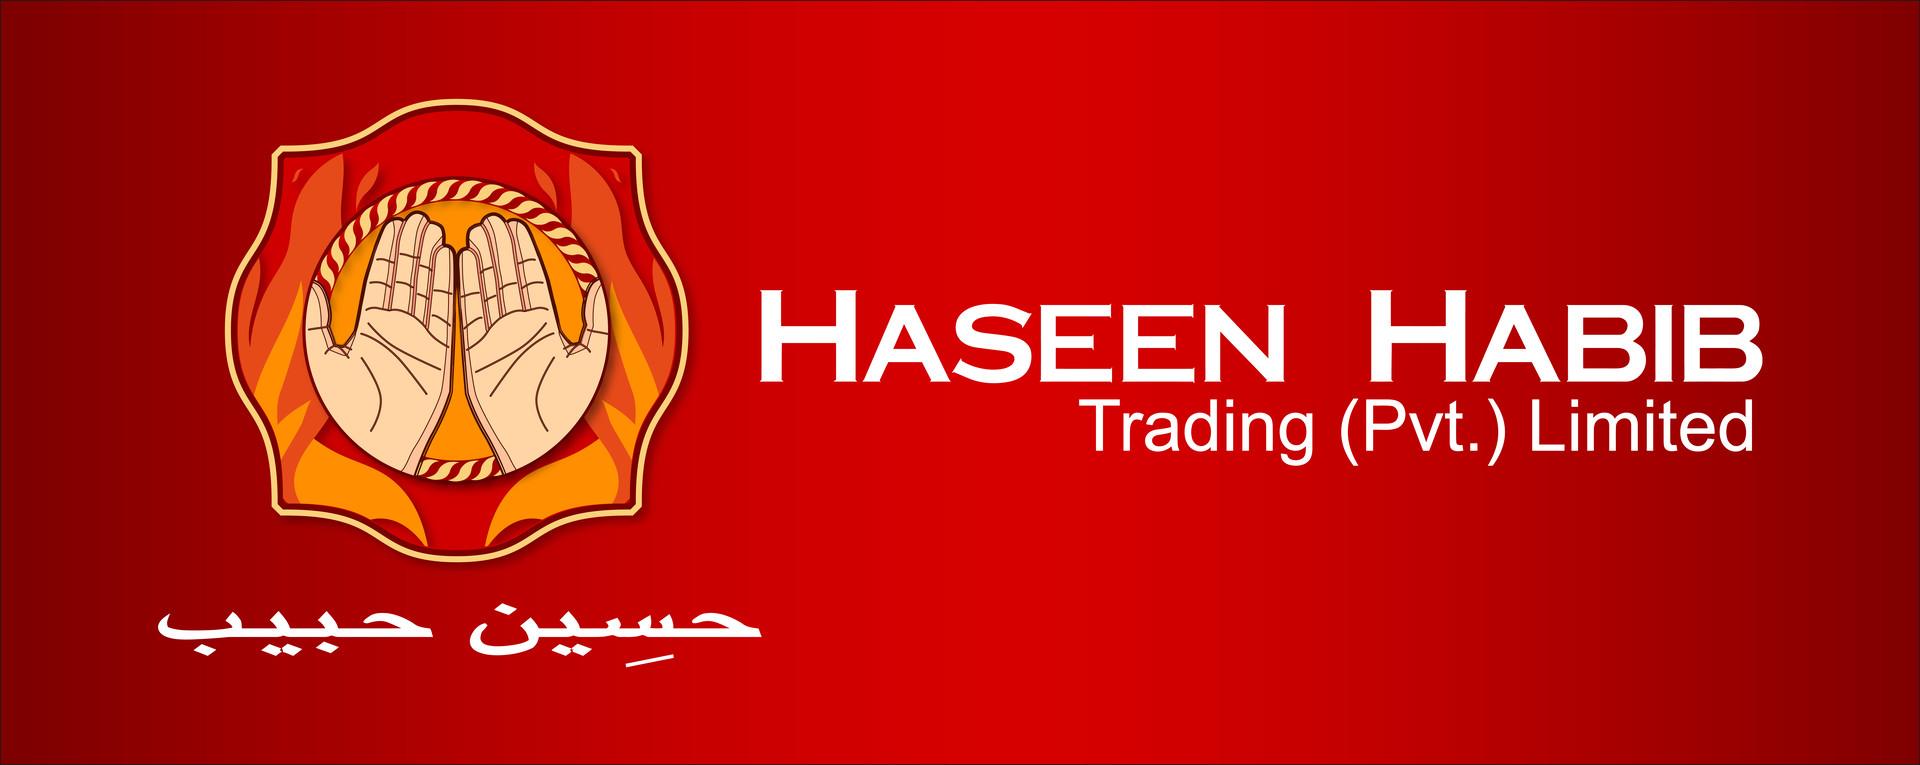 Mohammad Nidal Khan - Haseen Habib Fire Fighting Company